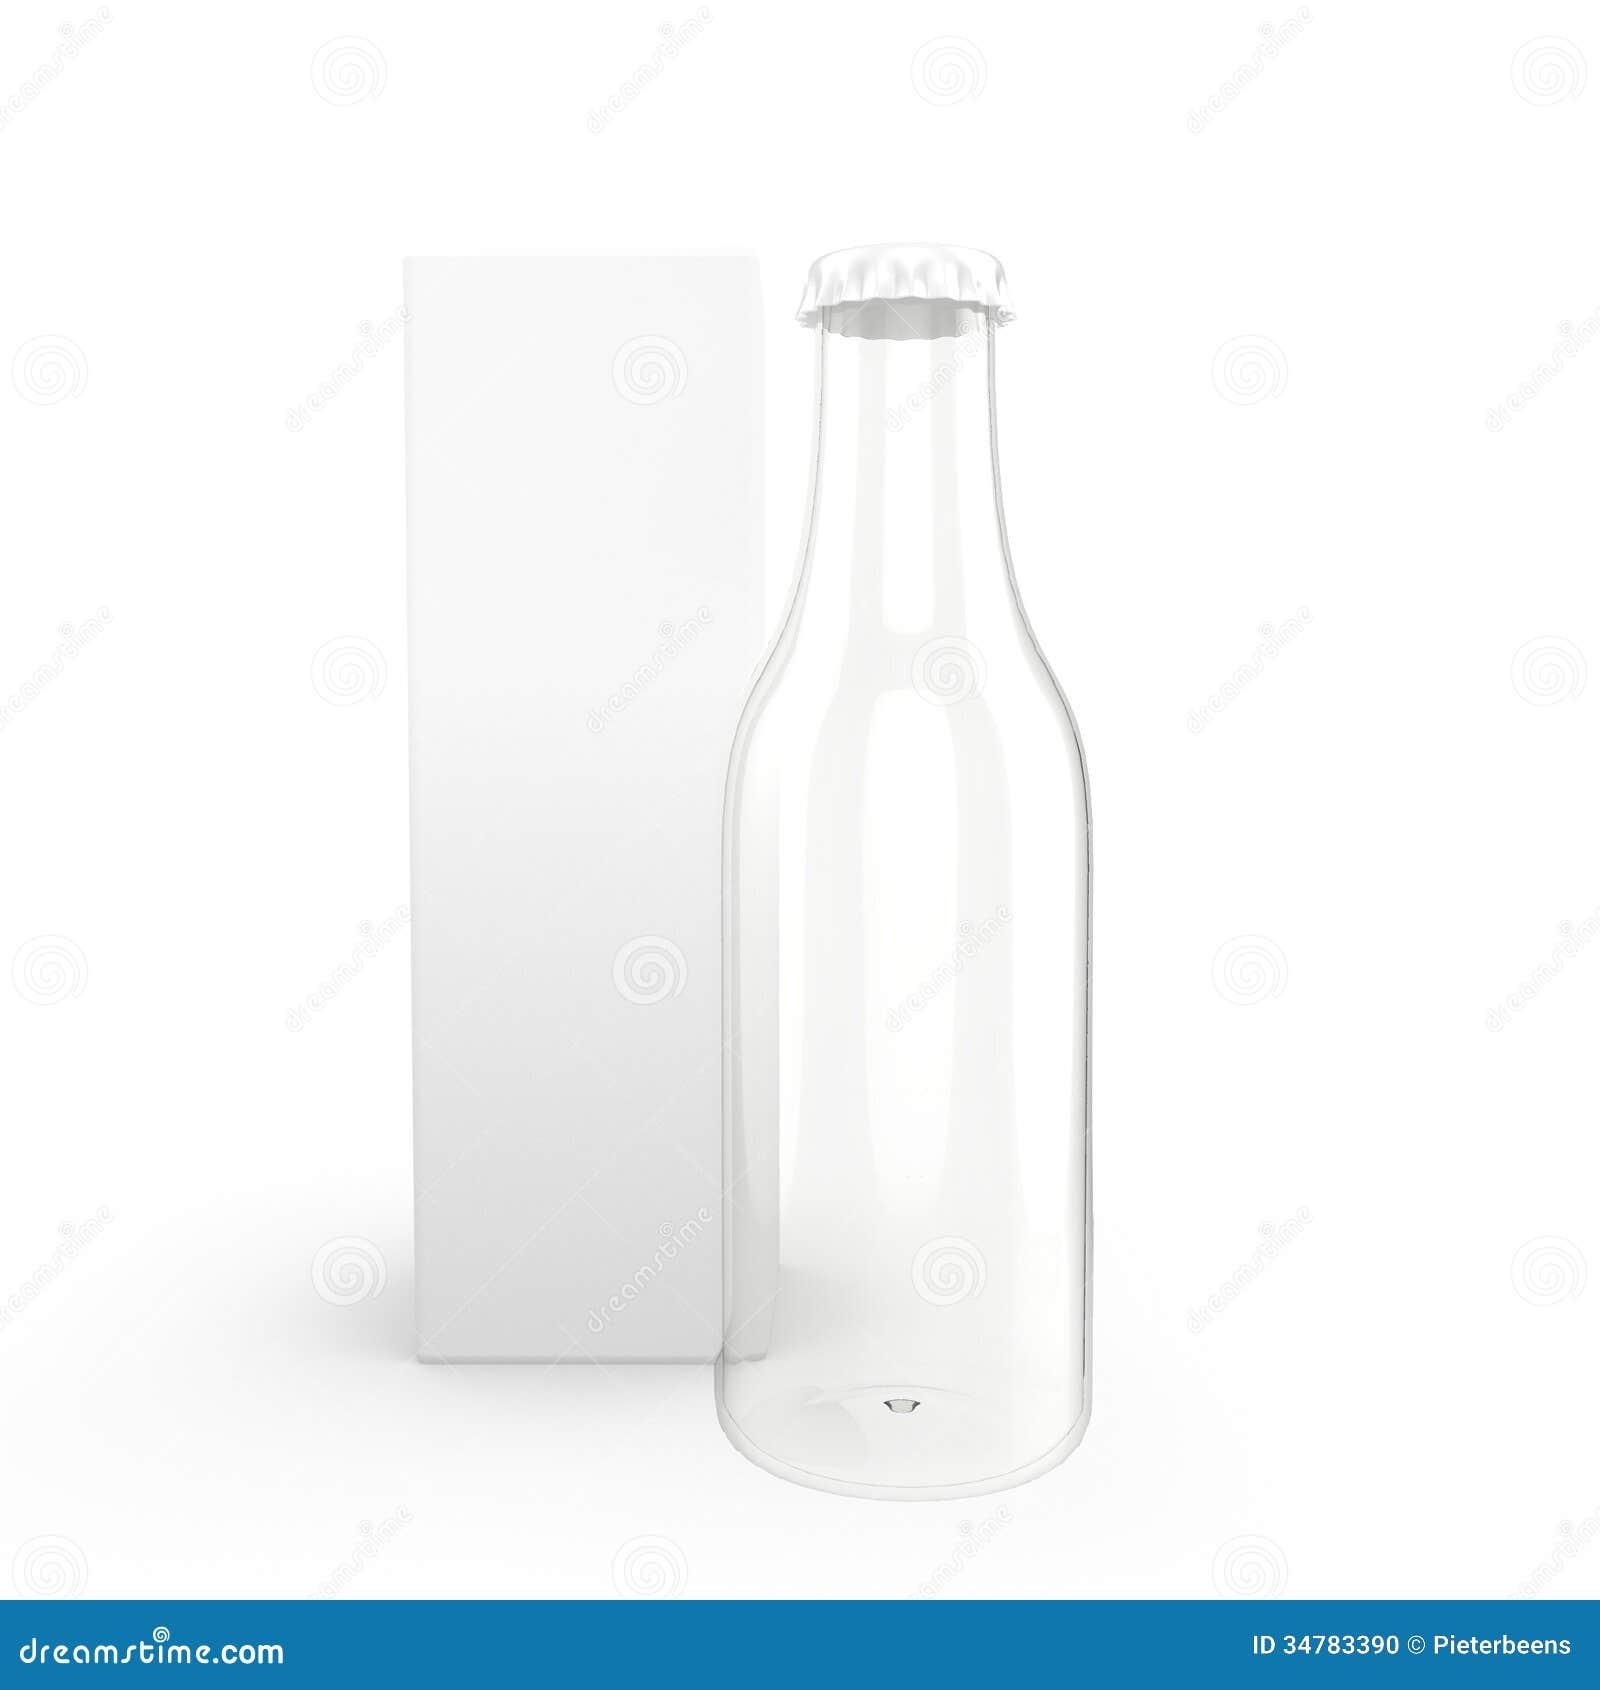 glass bottle with package stock illustration image of glass 34783390. Black Bedroom Furniture Sets. Home Design Ideas